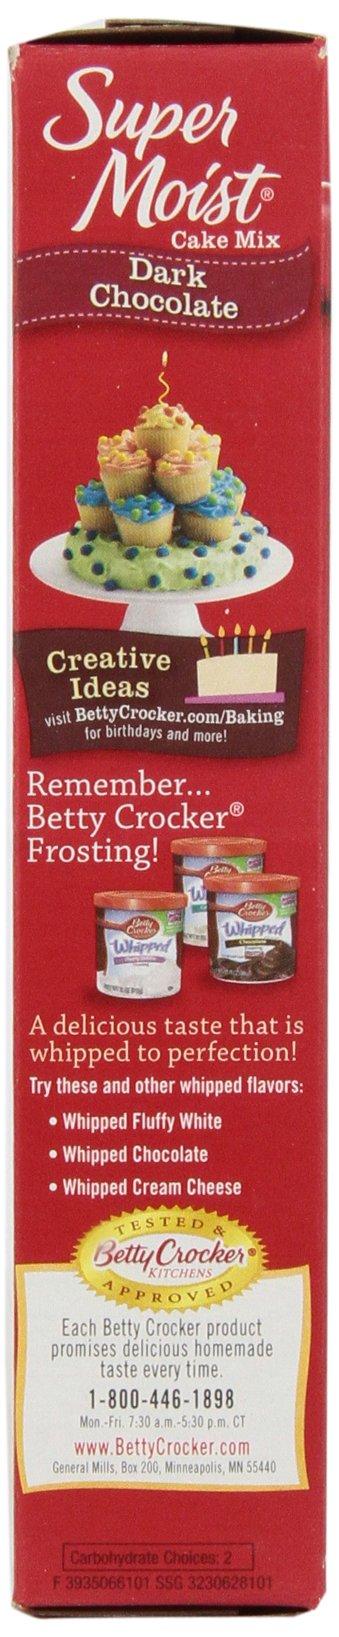 Betty Crocker Super Moist Cake Mix Dark Chocolate 15.25 oz Box (pack of 6) by Betty Crocker (Image #6)